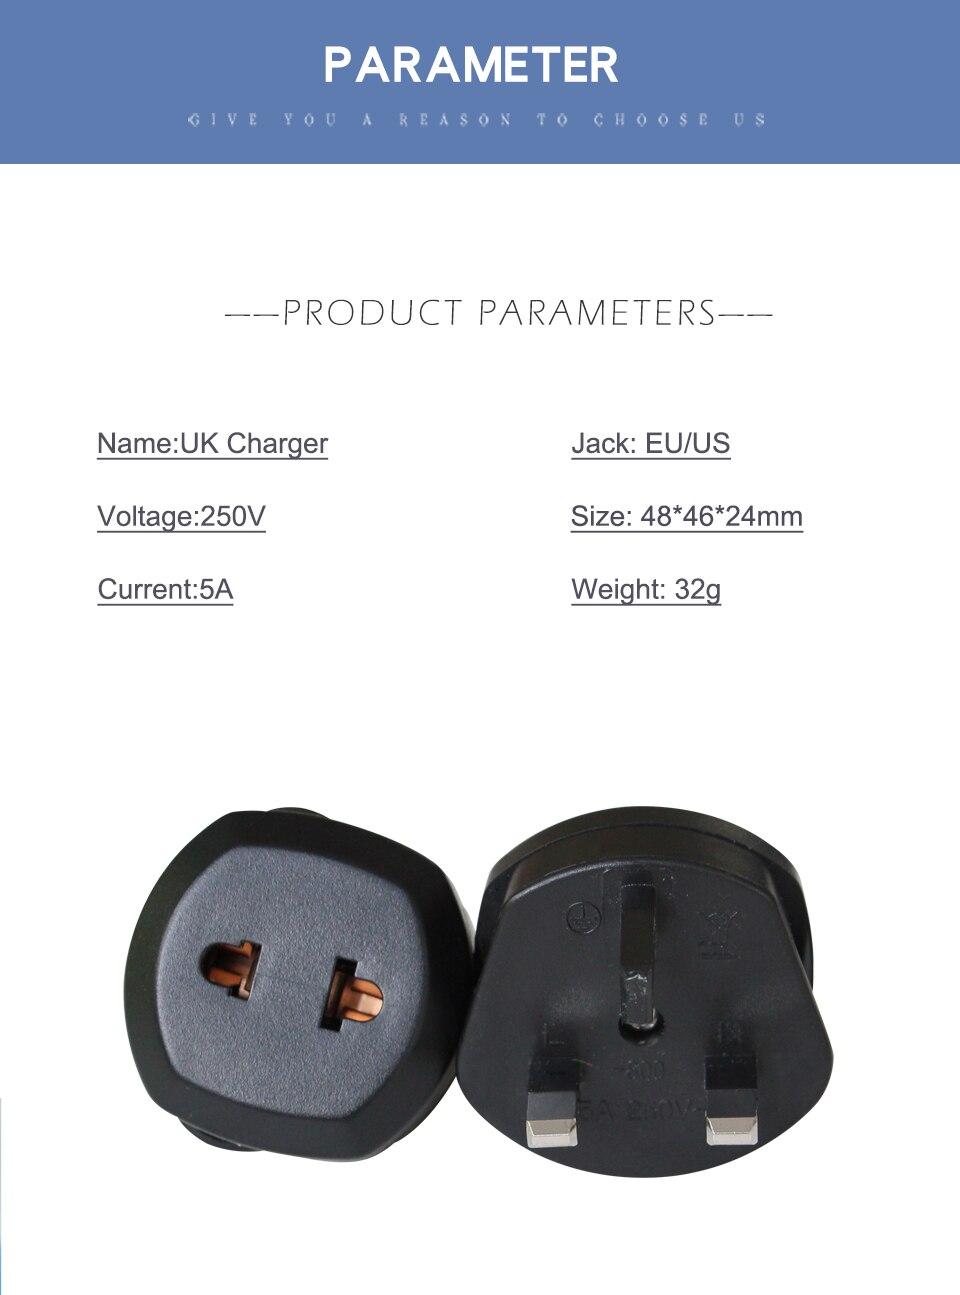 1 PC UK Adapter Travel Wall Power Plug Charger Adaptors Converter Connector uk Plug 3 Pin Socket Singapore Maldives Malaysia (7)